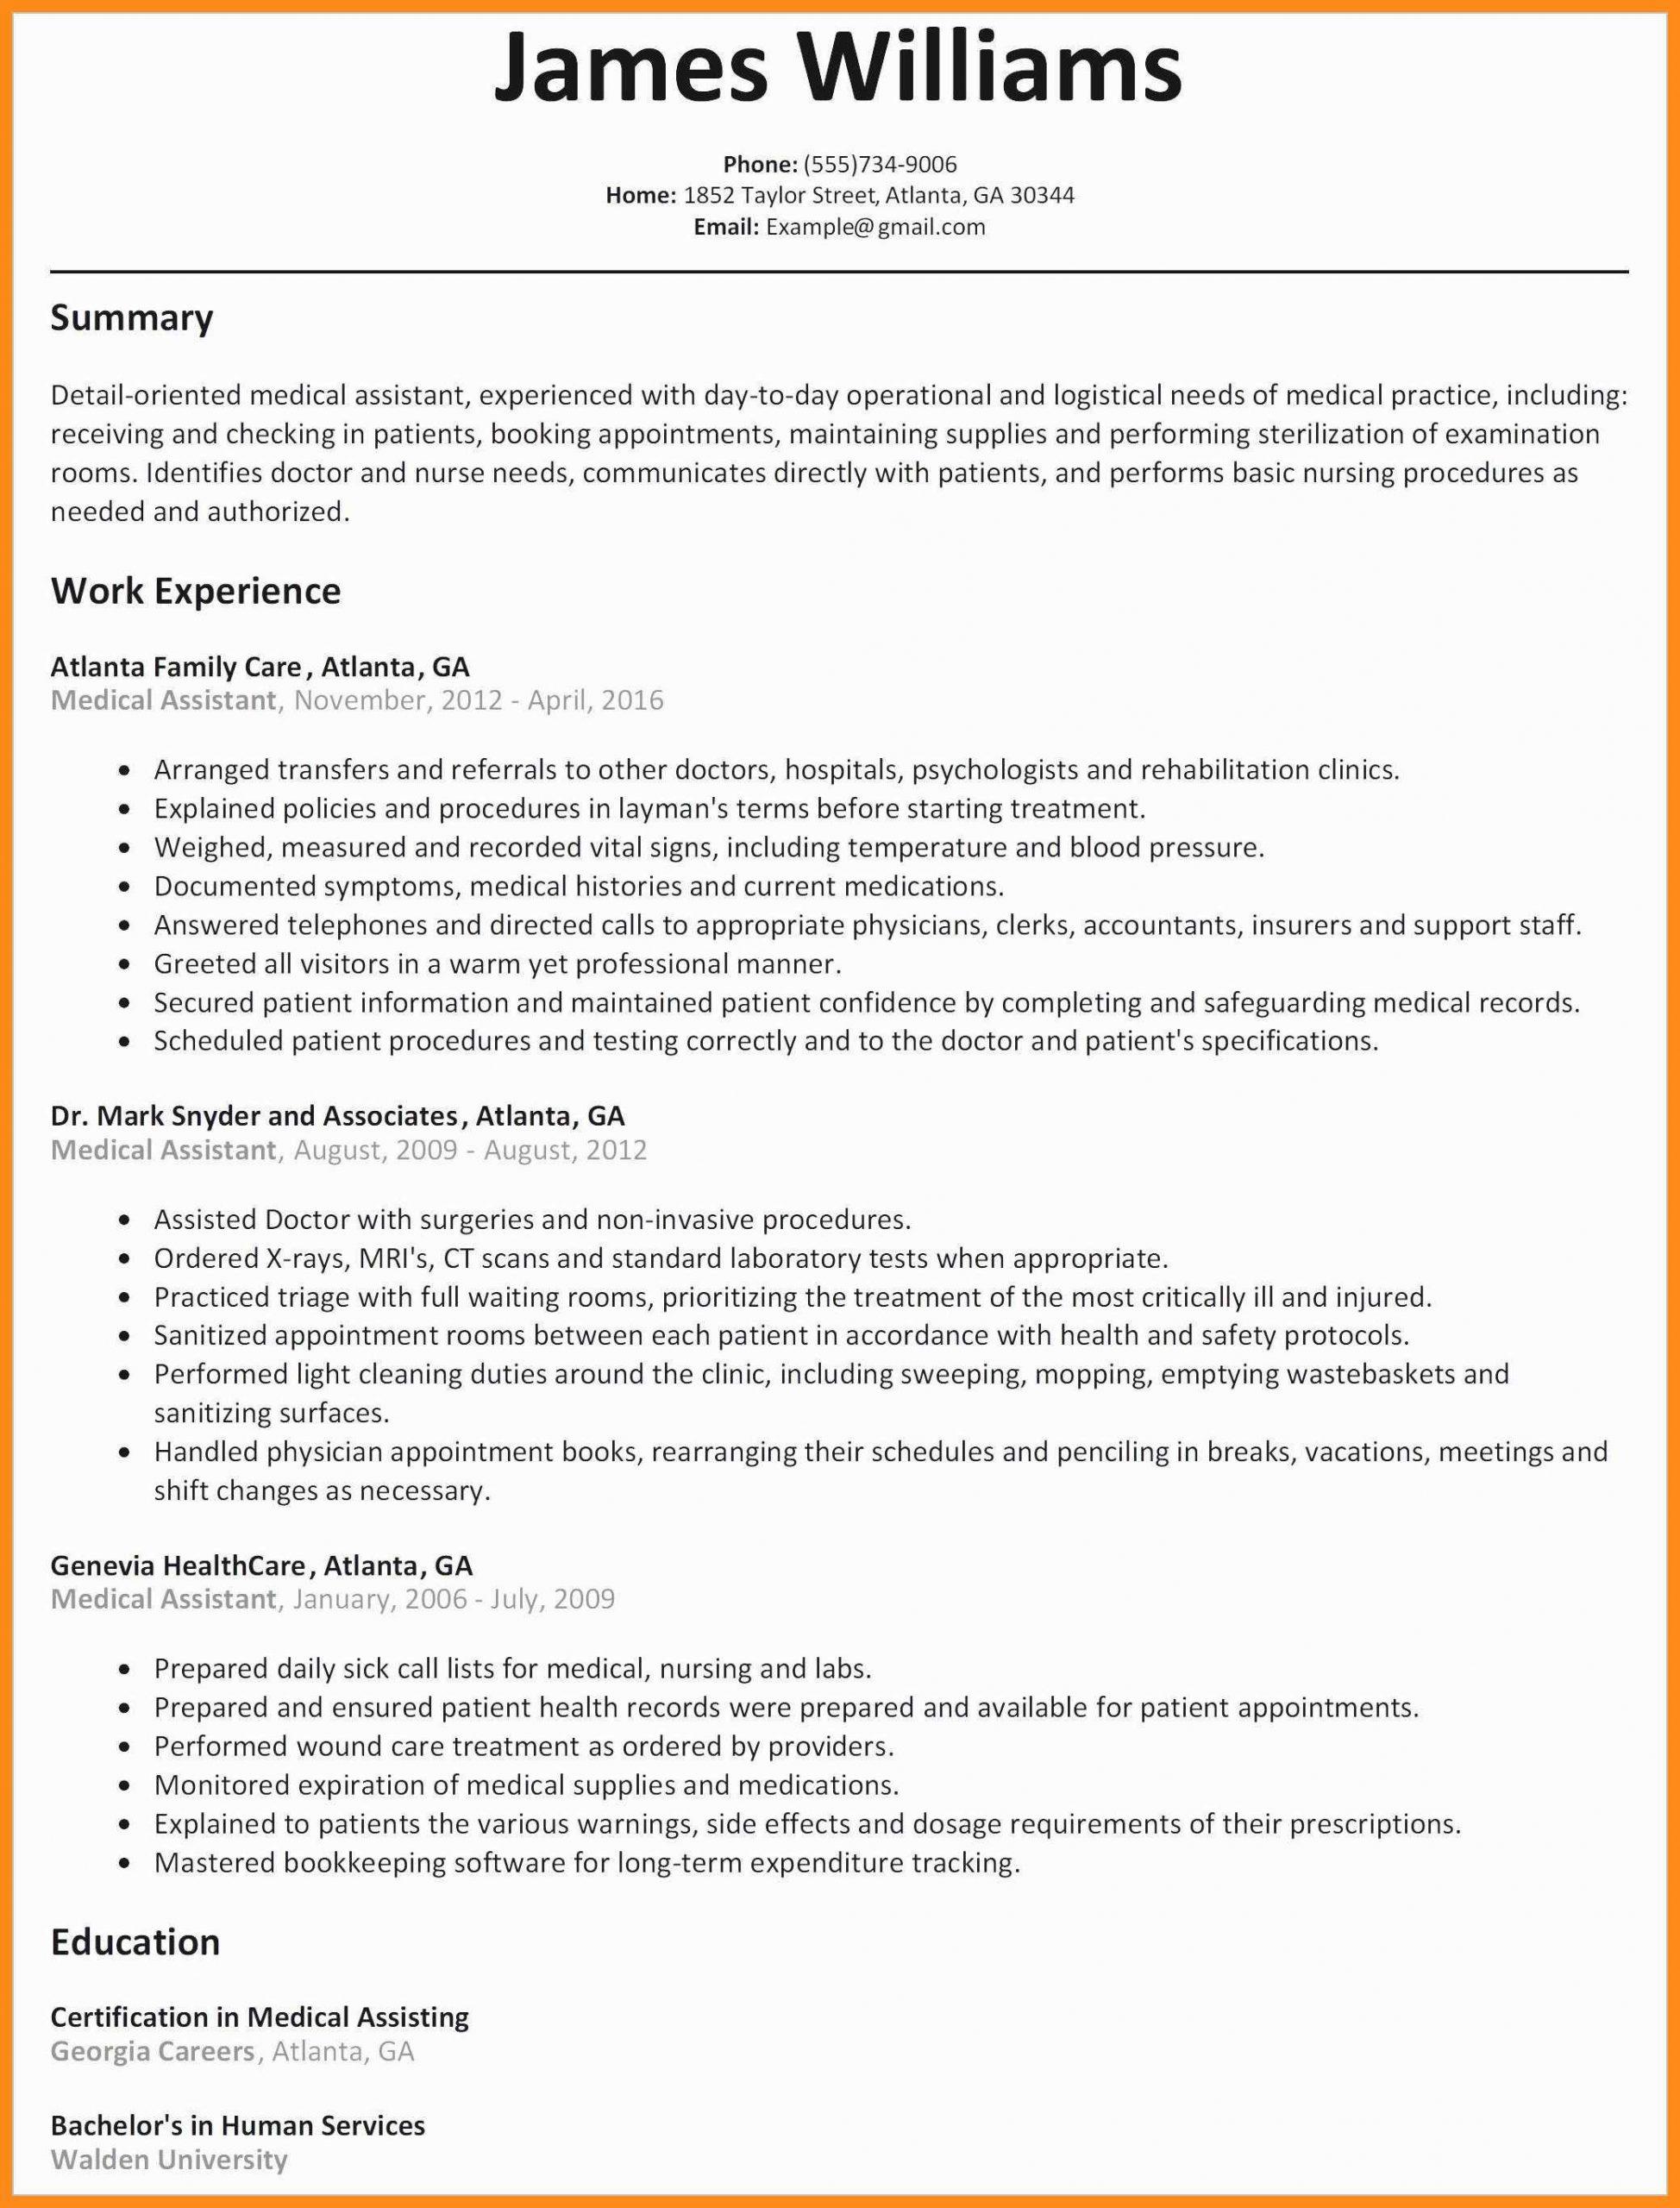 12 13 mobile application testing resumes